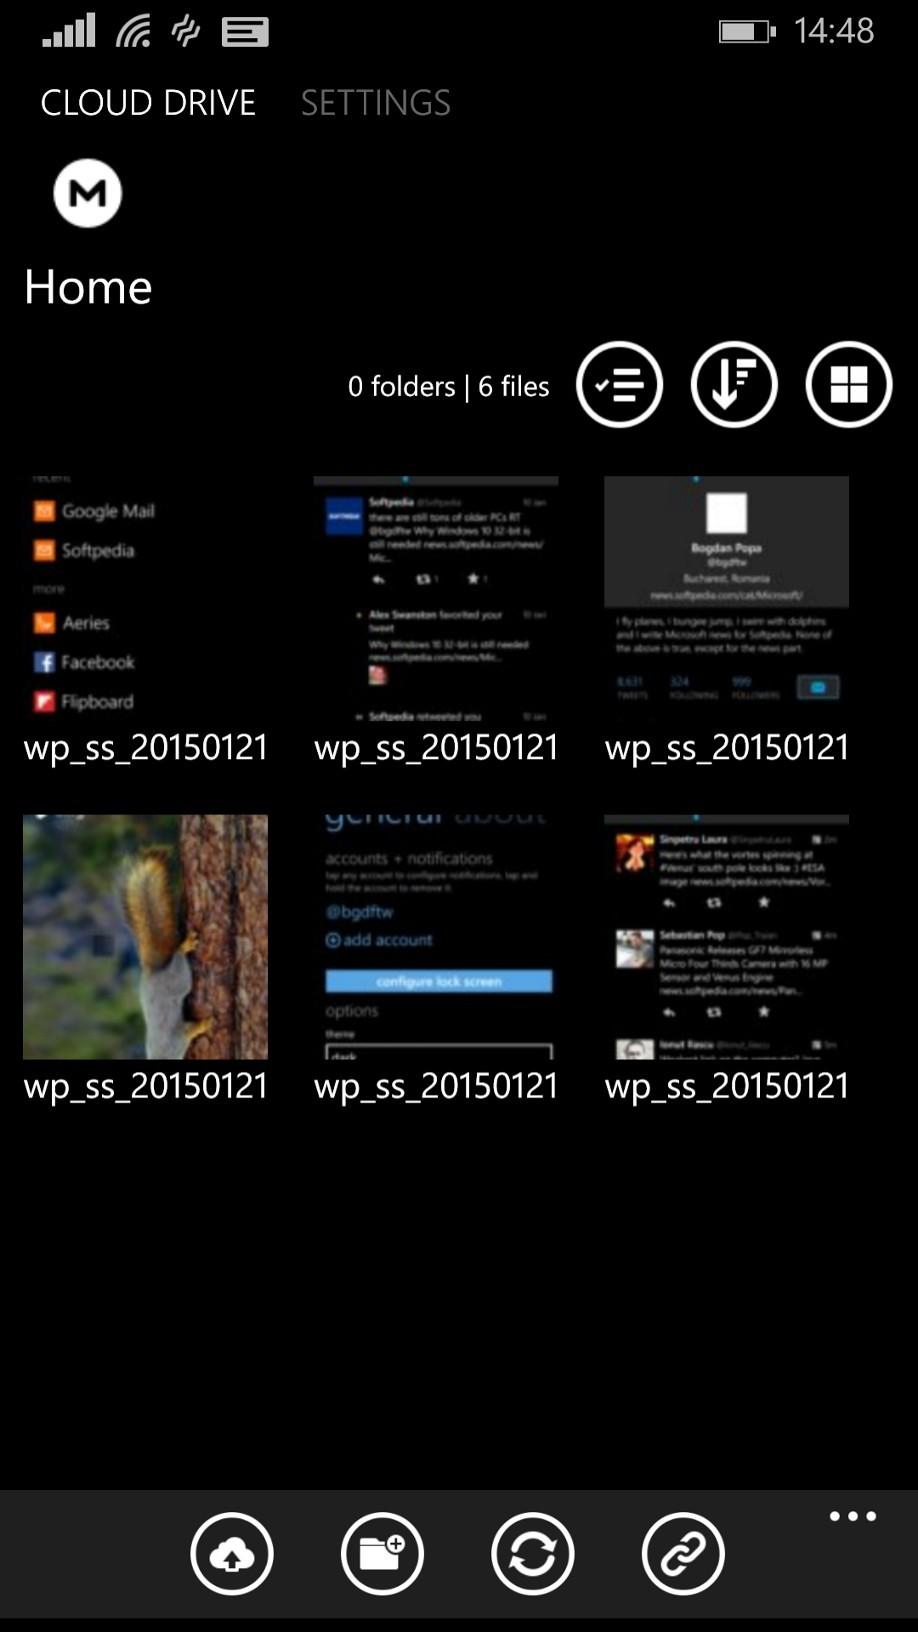 Windows Phone App Download